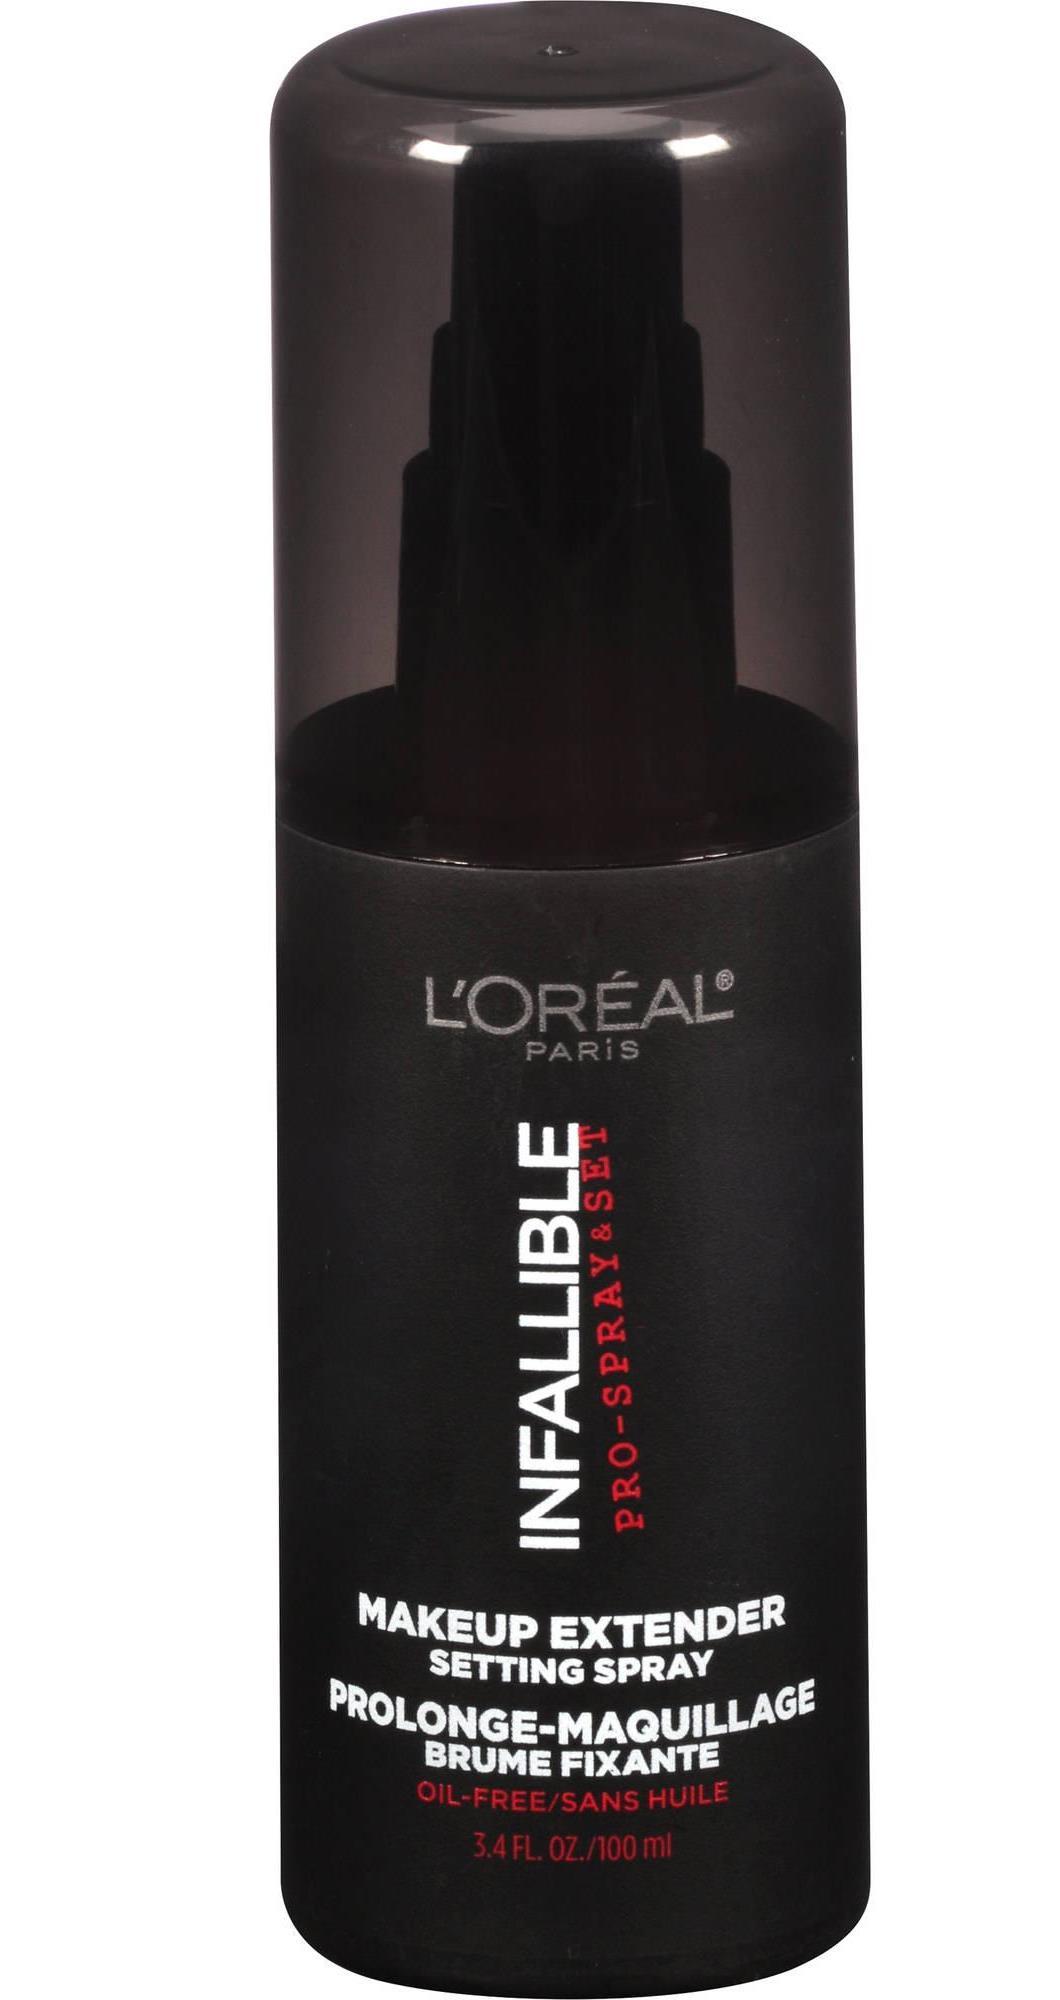 L'Oreal Paris' Infallible Pro-Spray